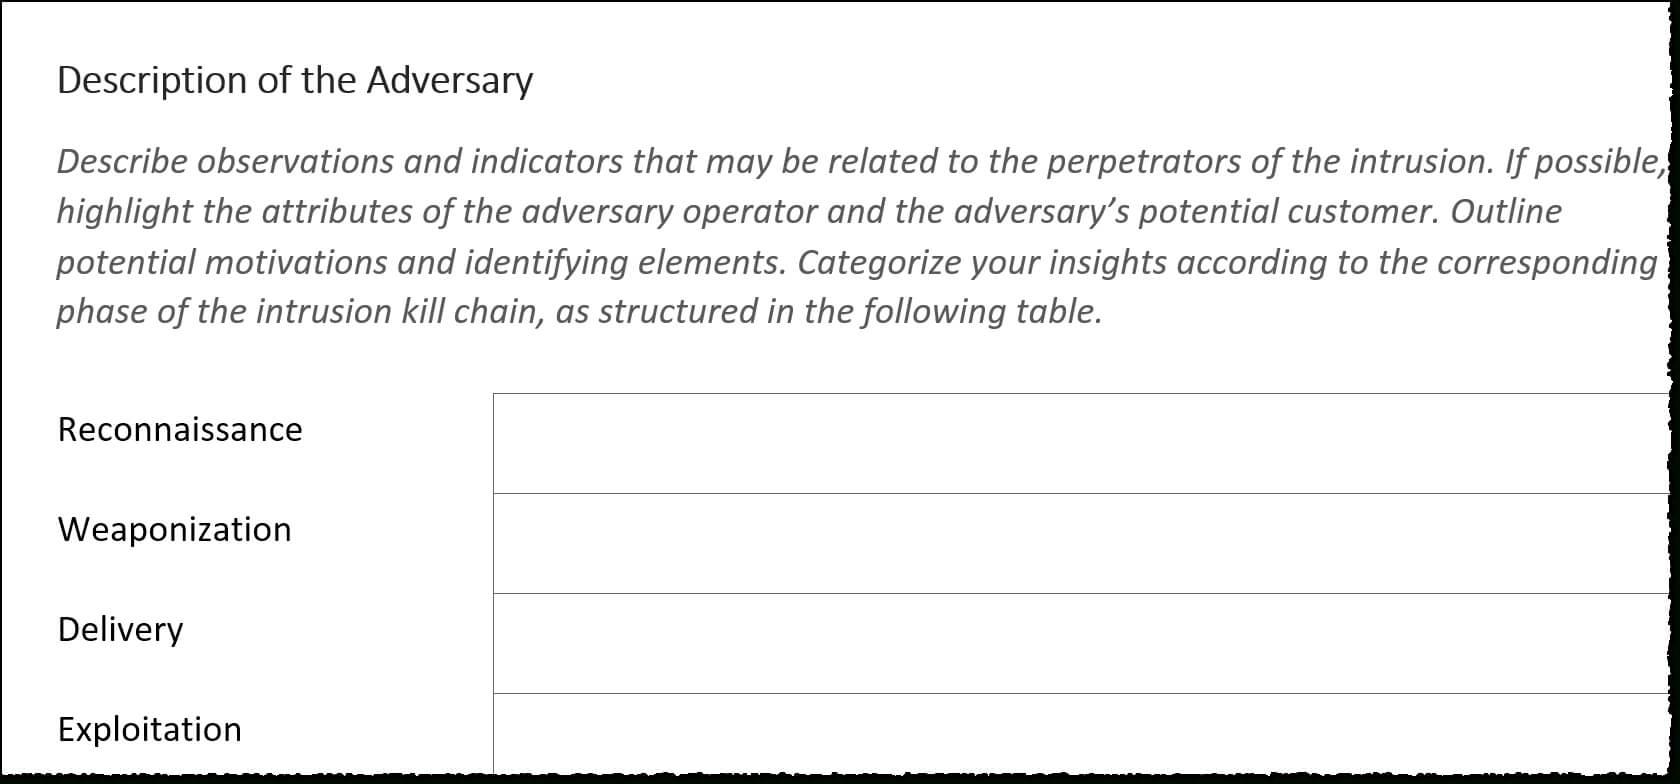 Threat Assessment Report Template - Atlantaauctionco pertaining to Threat Assessment Report Template